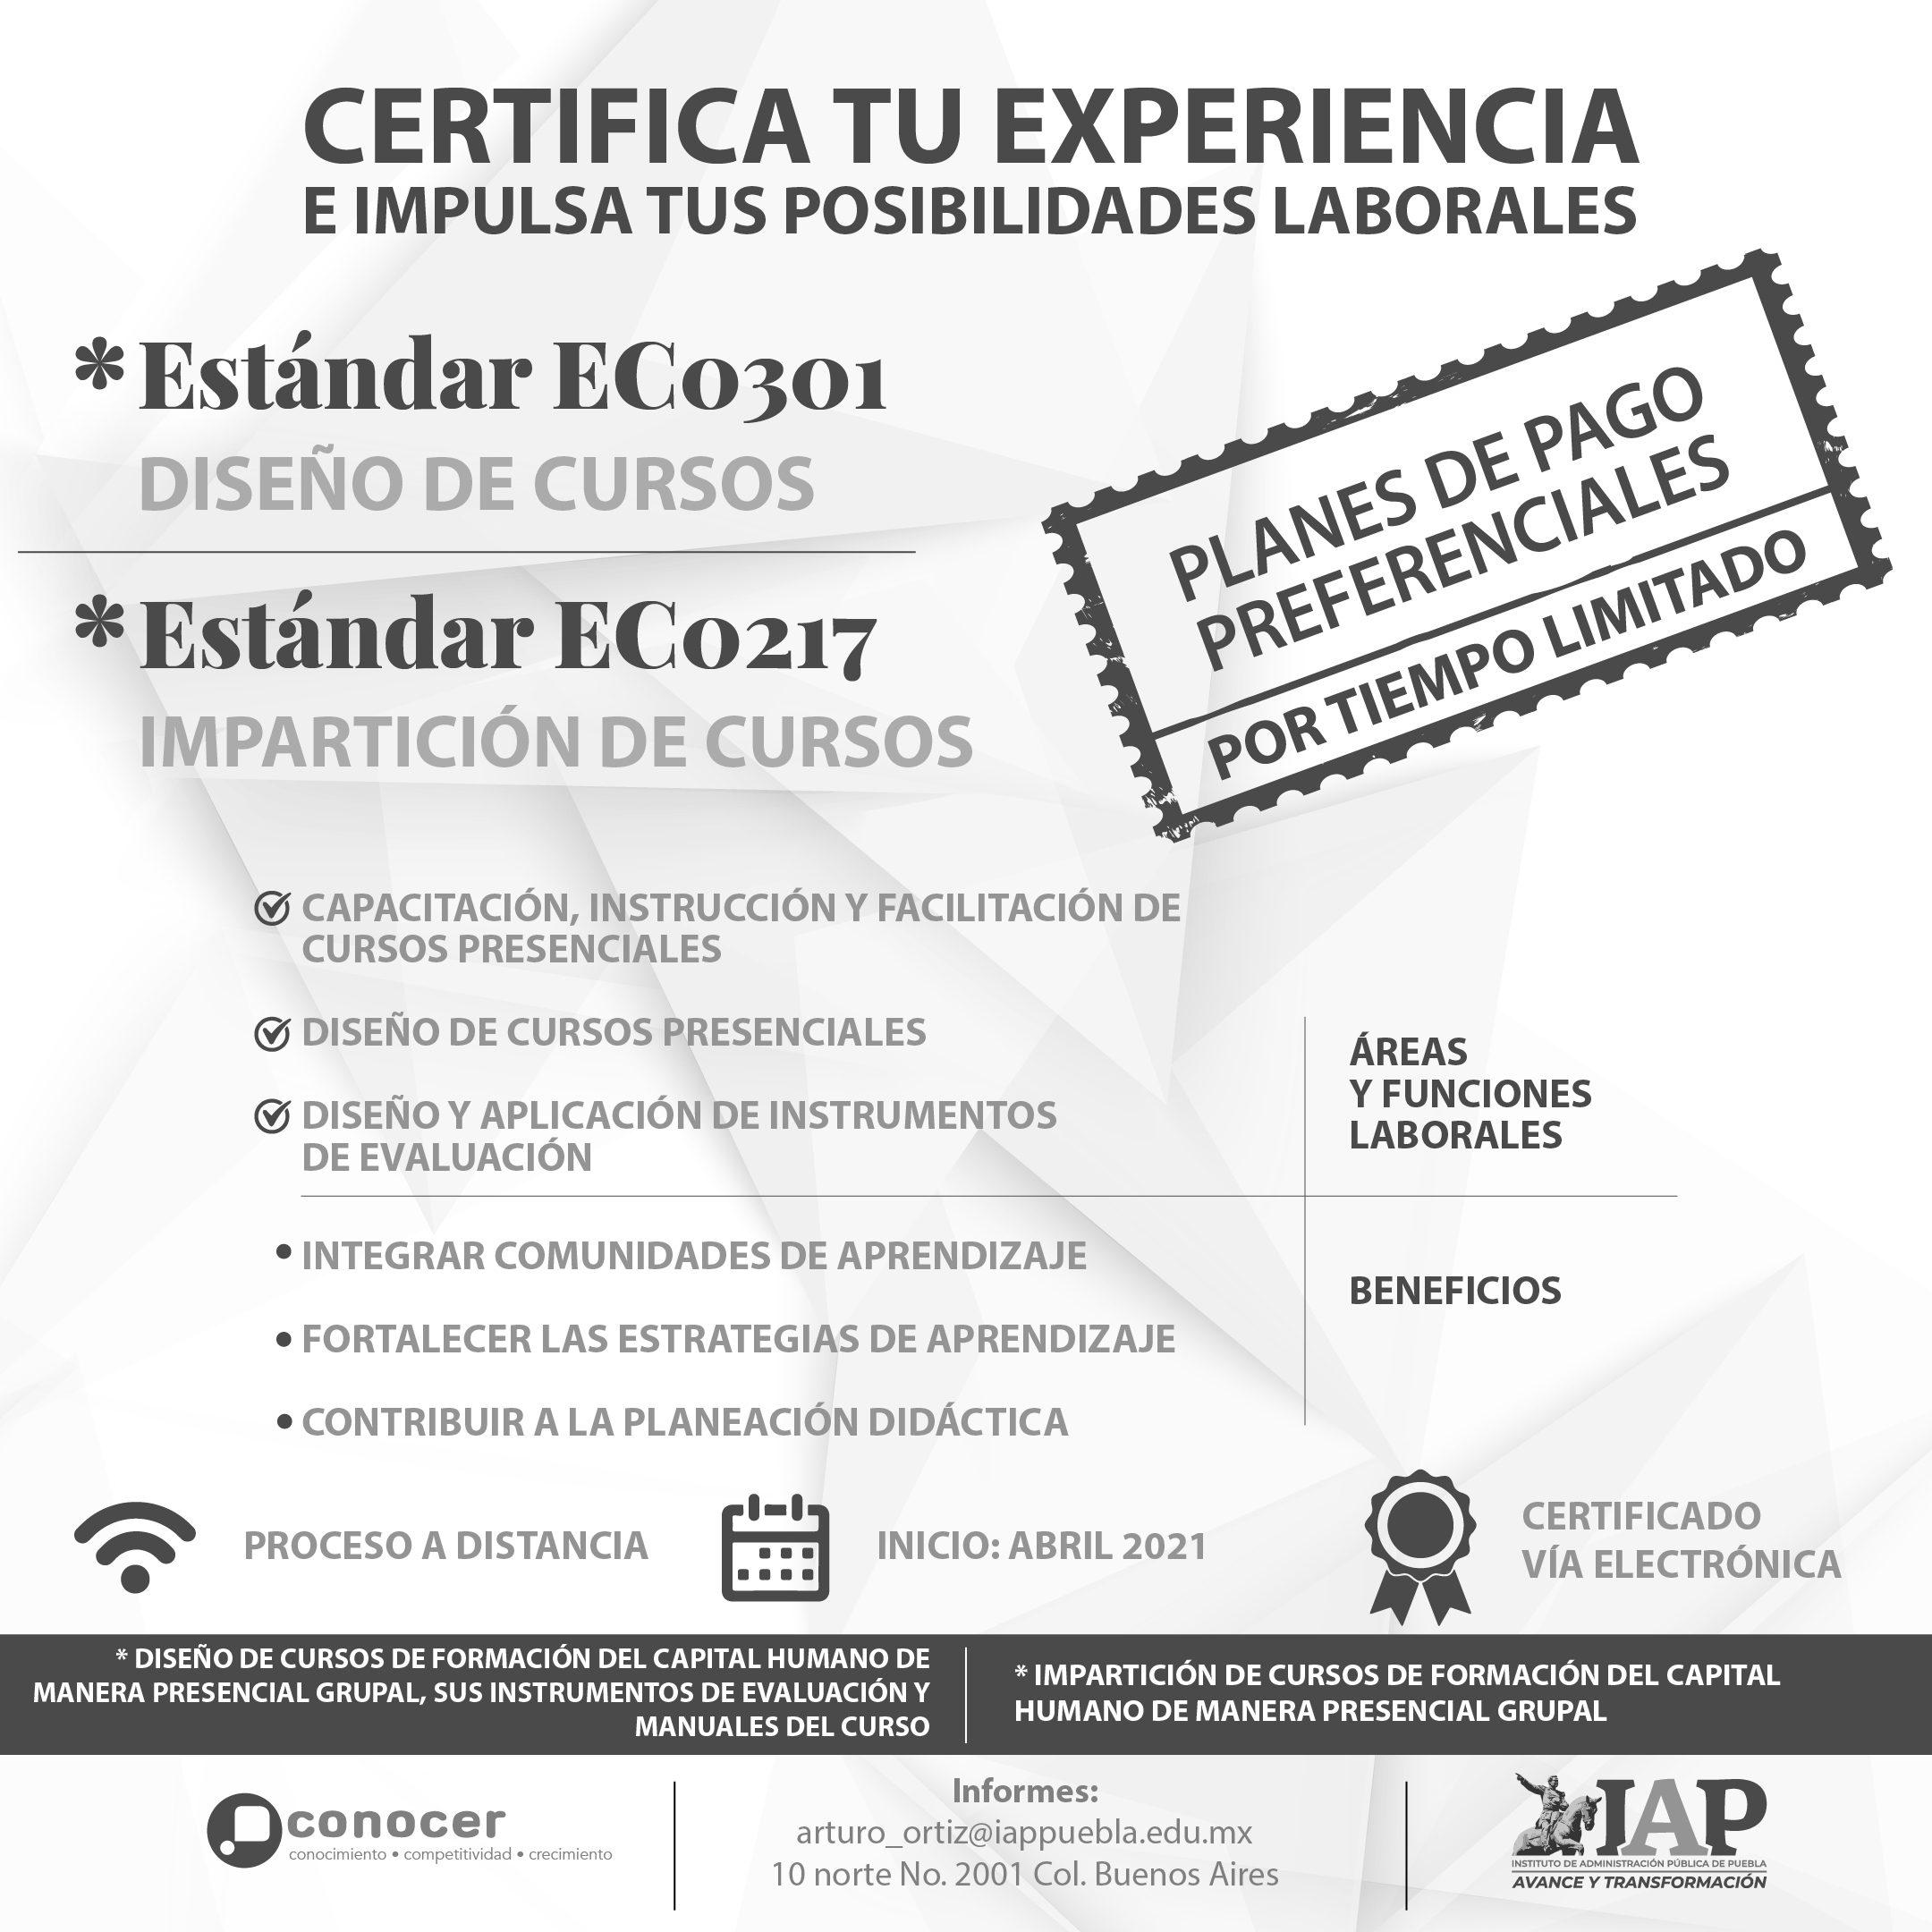 Estándar de Competencia 0217 | Estándar de Competencia 0301